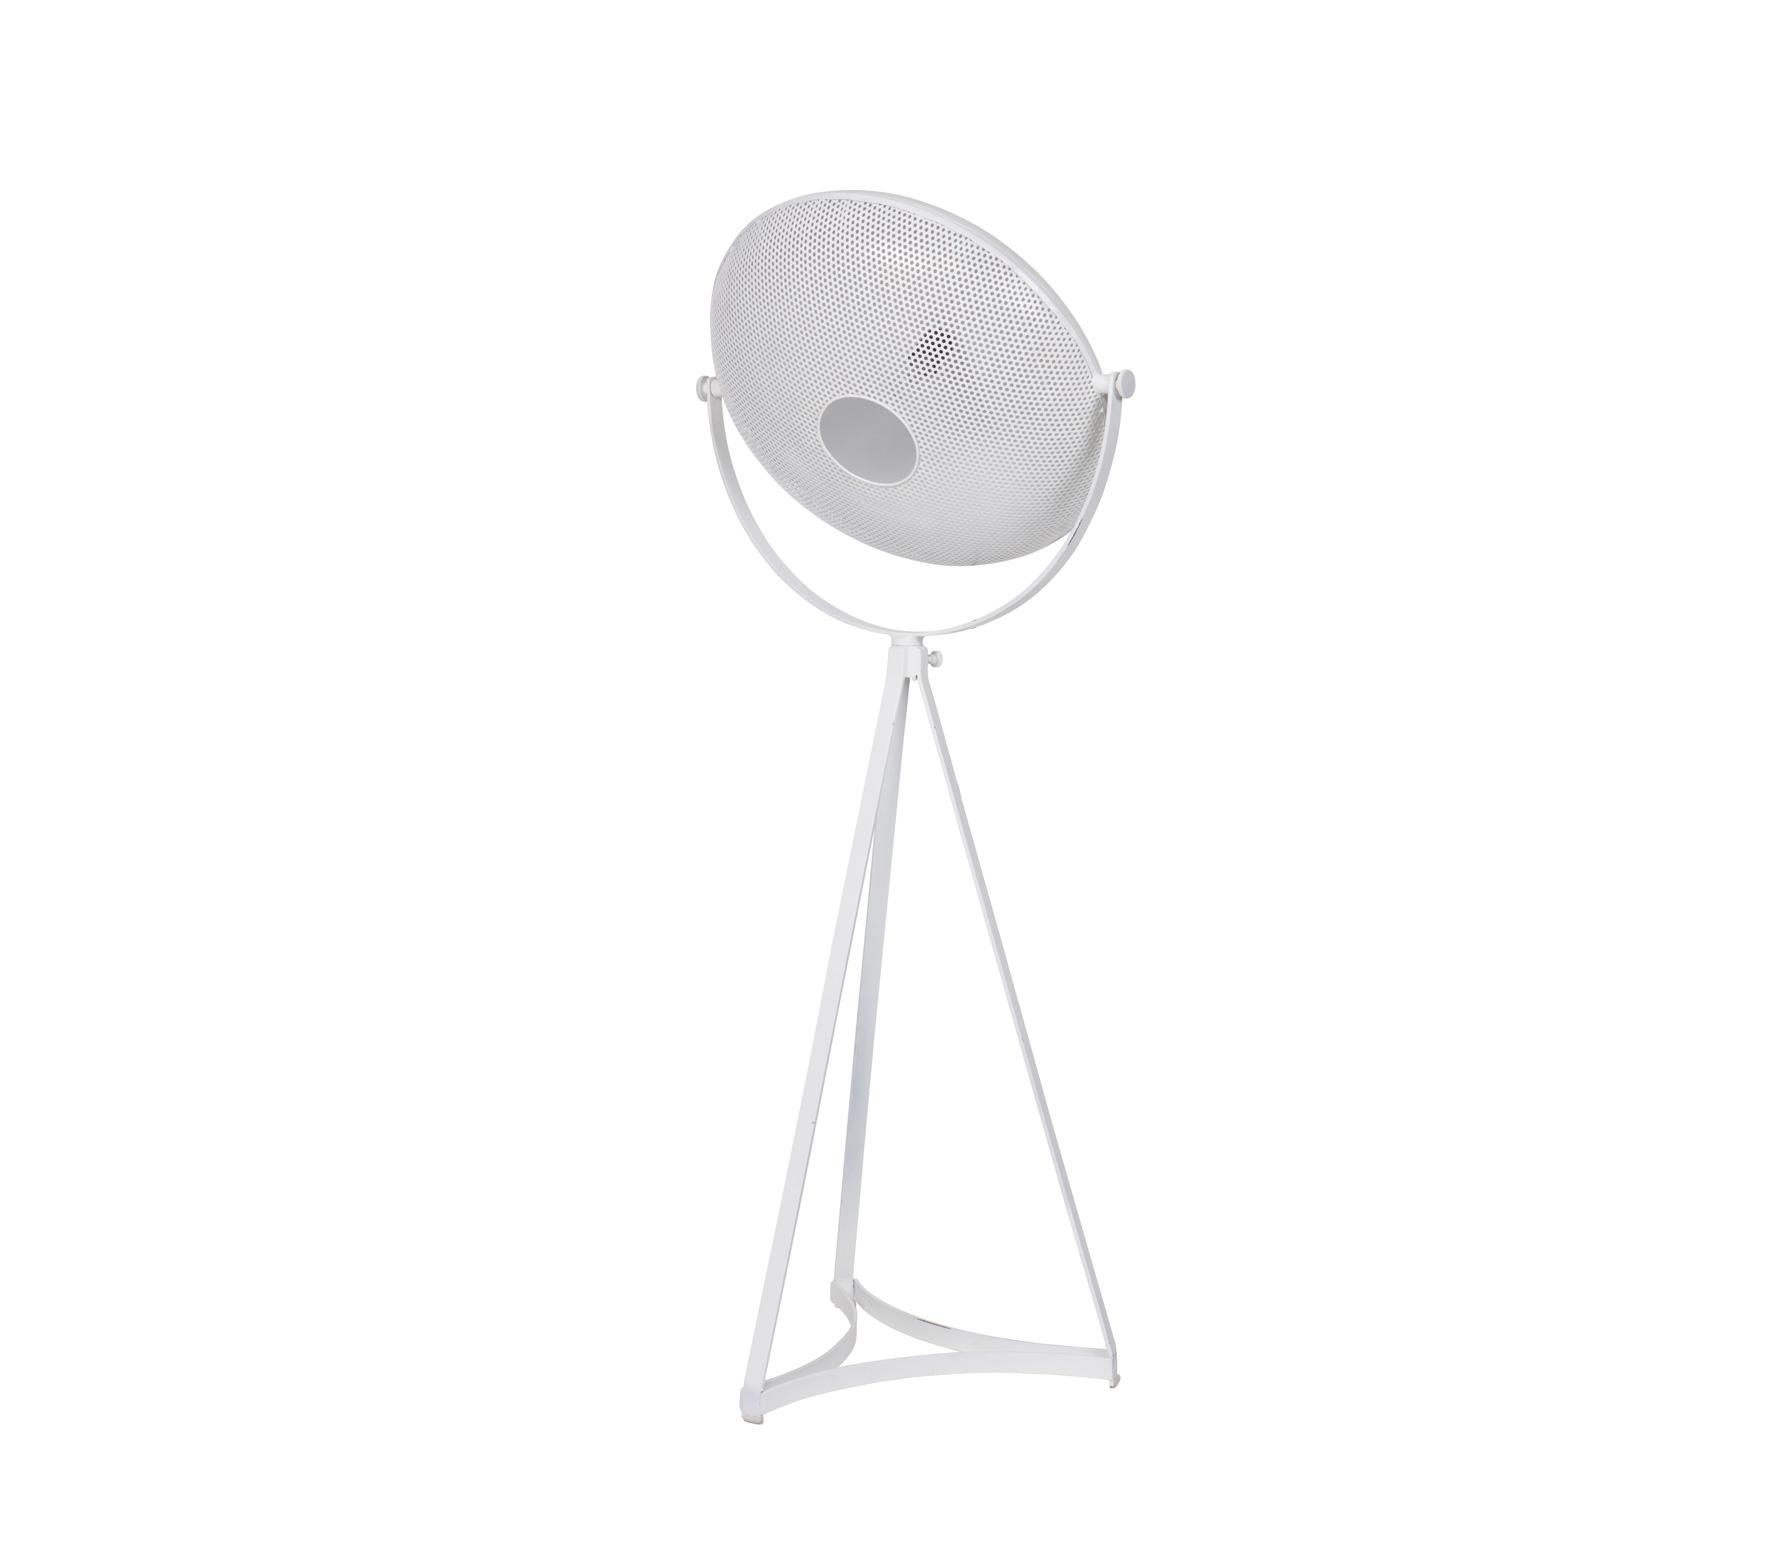 BePureHome Blown vloerlamp wit metaal Wit